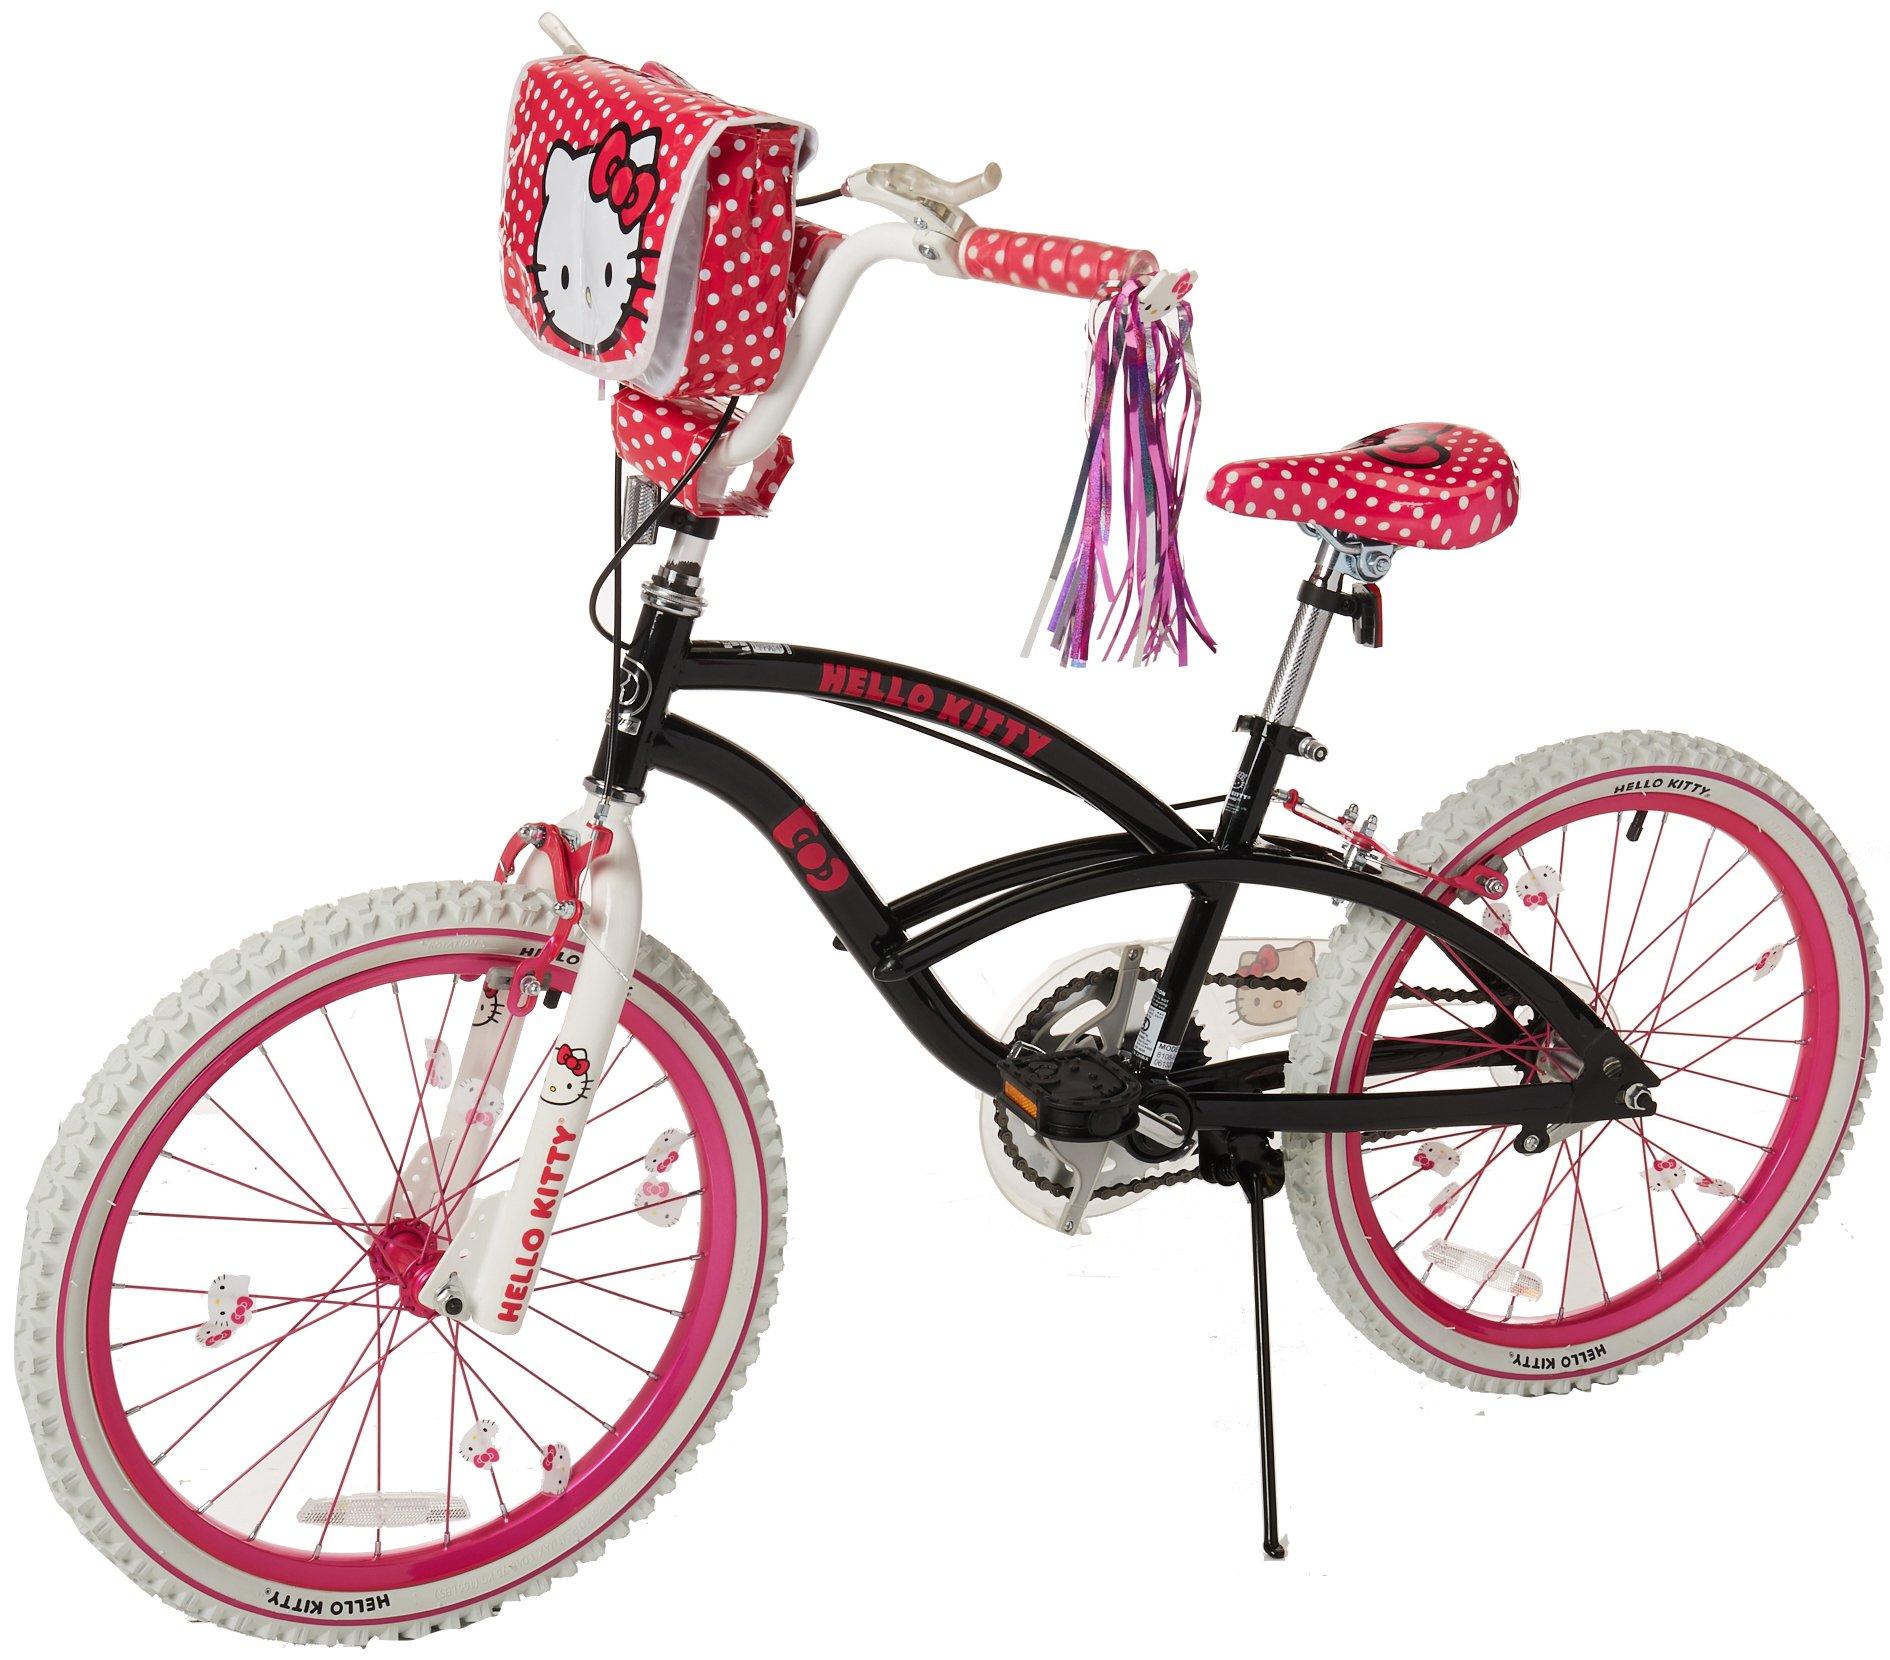 Hello Kitty 8108-60TJ Girls Bike, 20-Inch, Black/Pink/White by Hello Kitty